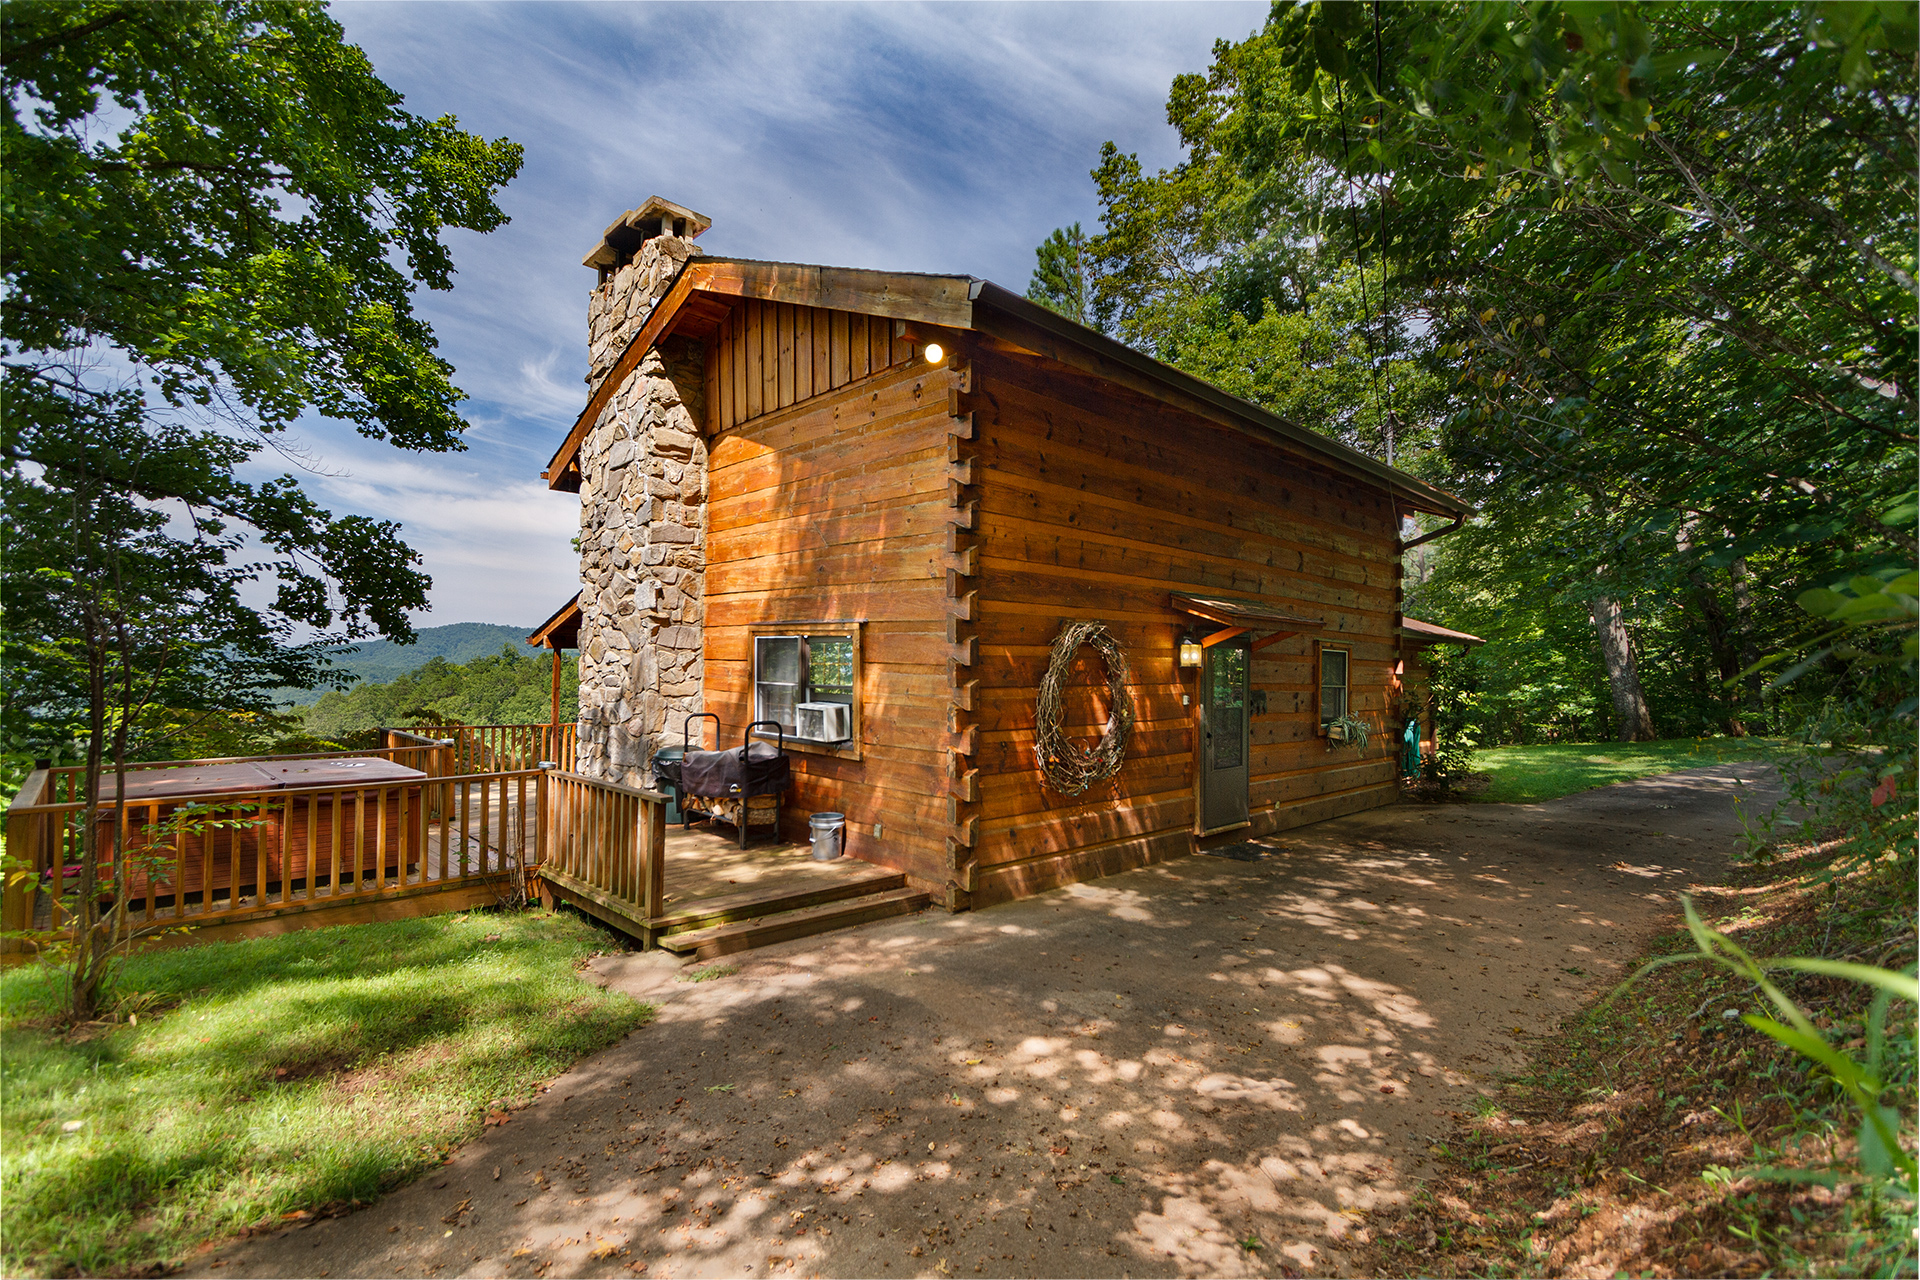 Grandpa S Smoky Mountain Log Cabin Vacation Rental 1 Bedroom